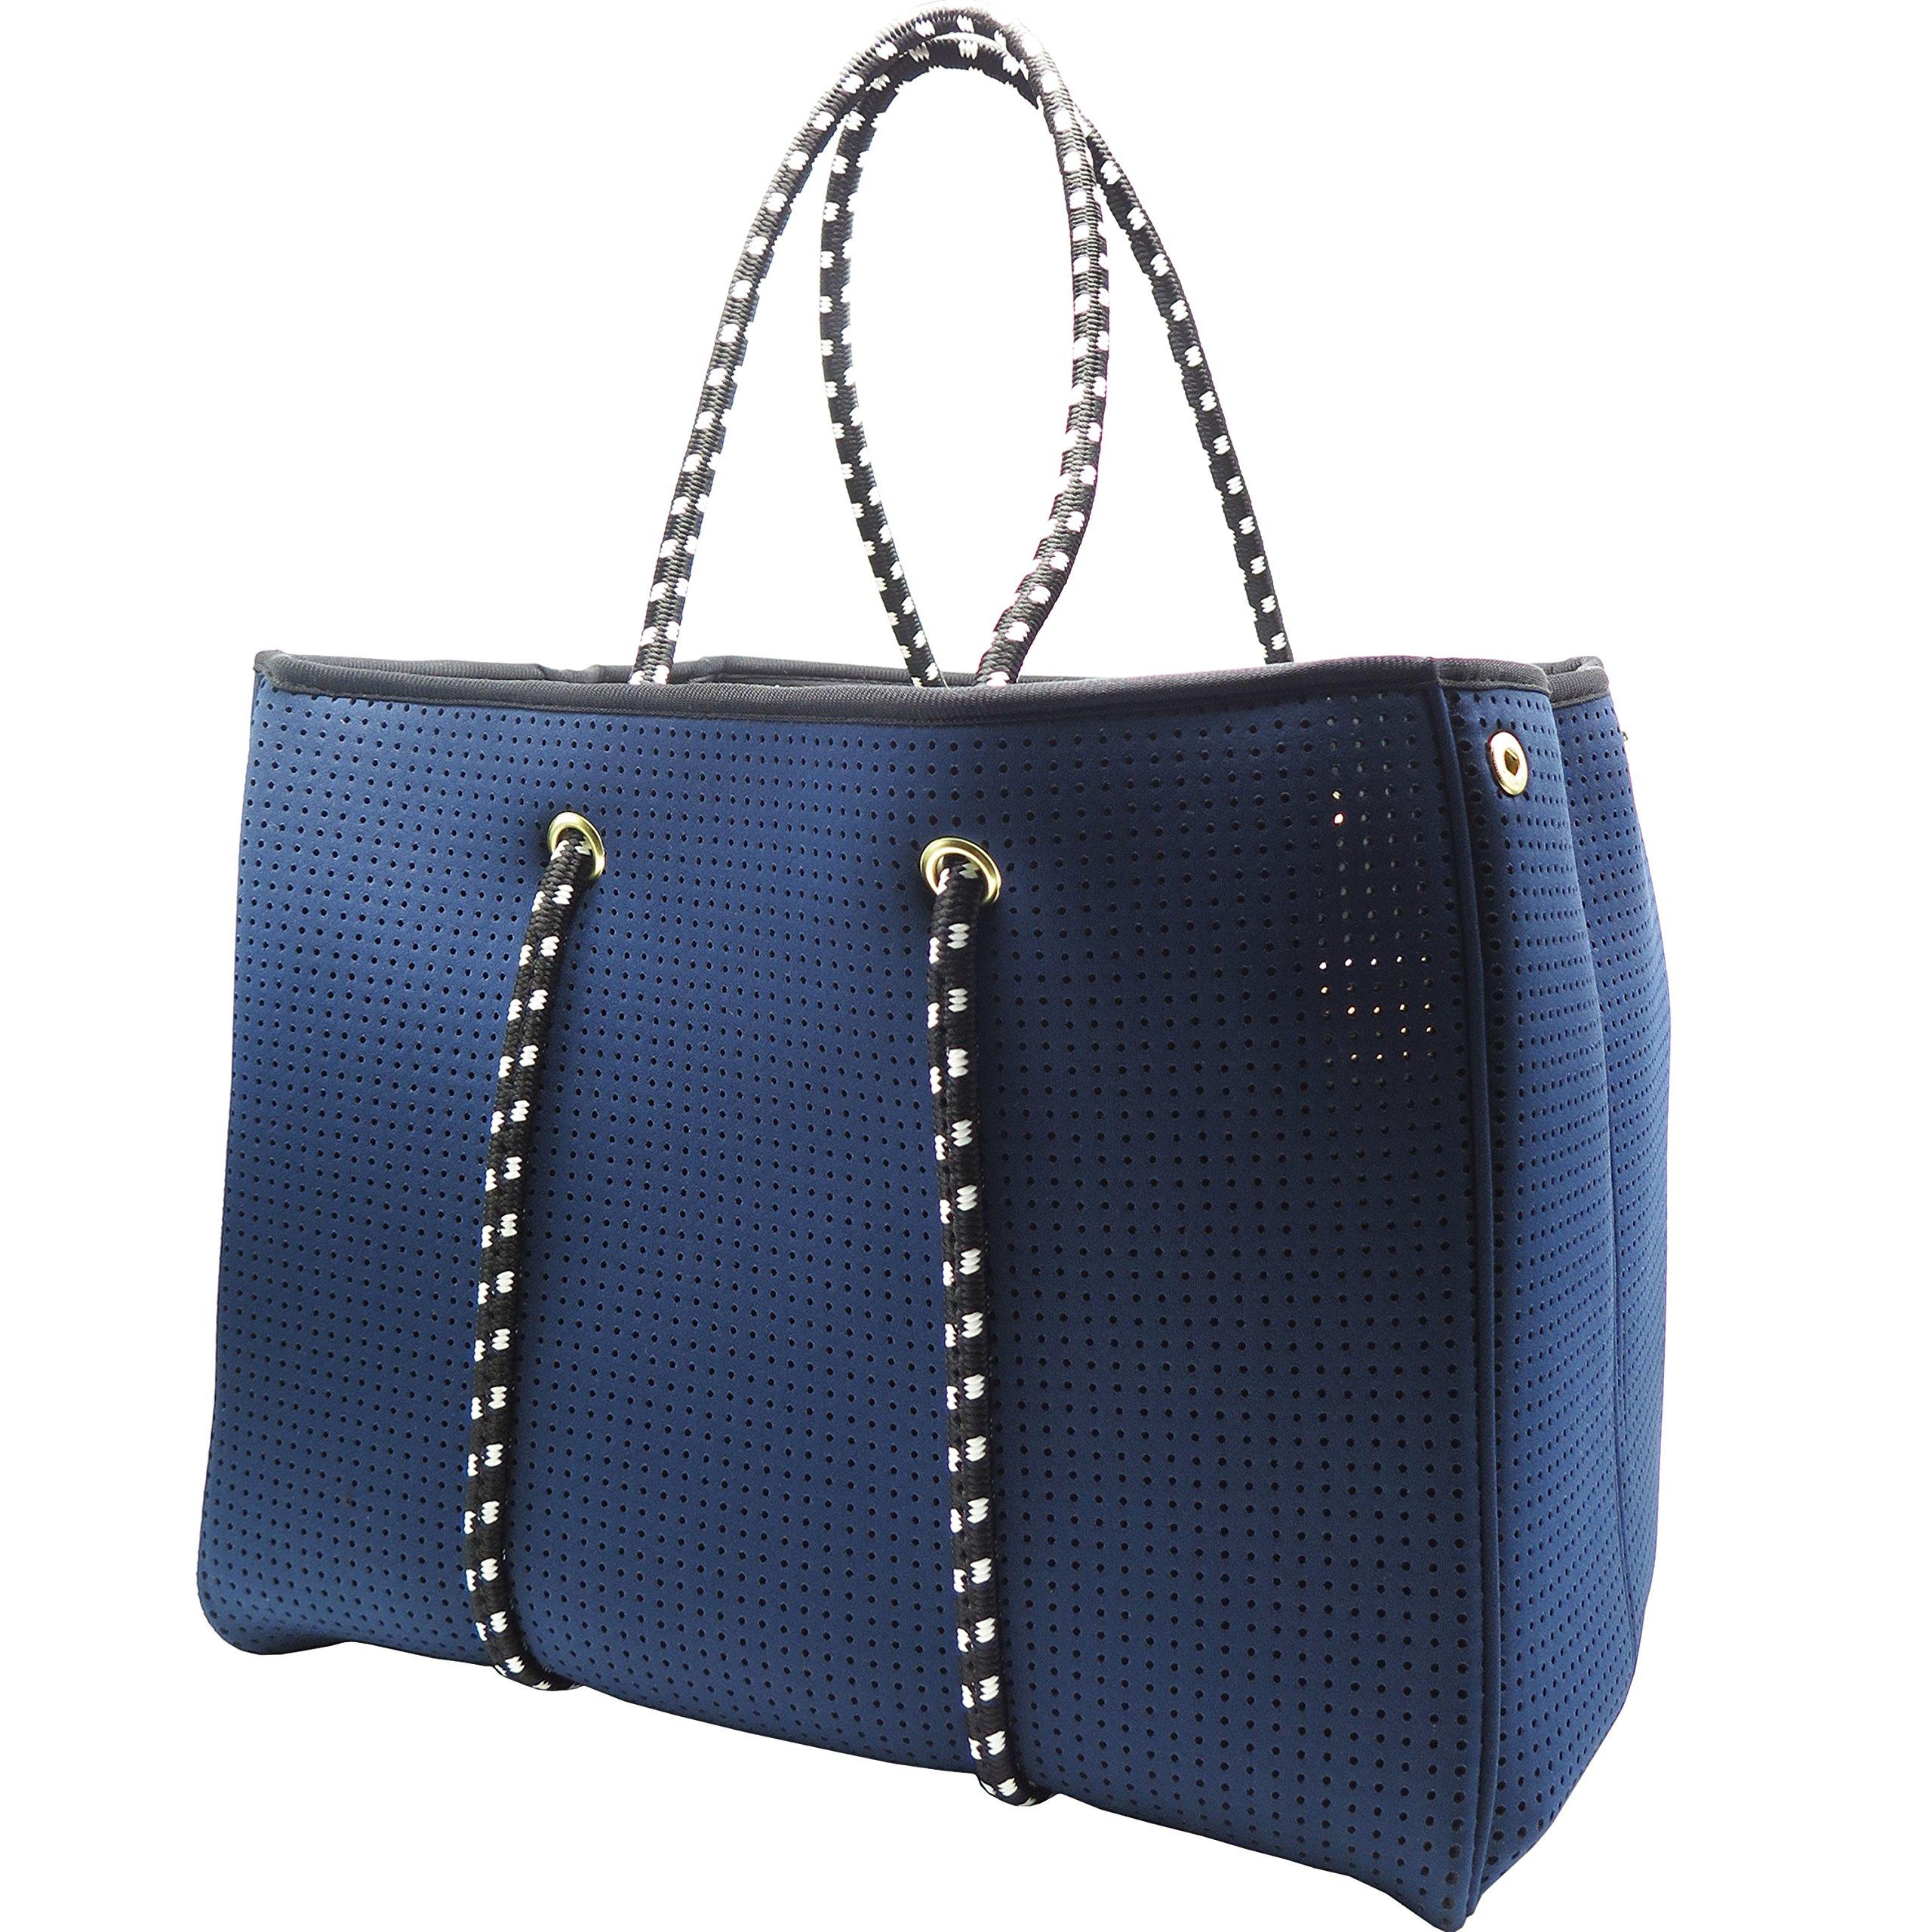 Neoprene Beach Bag tote - Large Daily Mesh Bag by Penn & Soph (Blue)